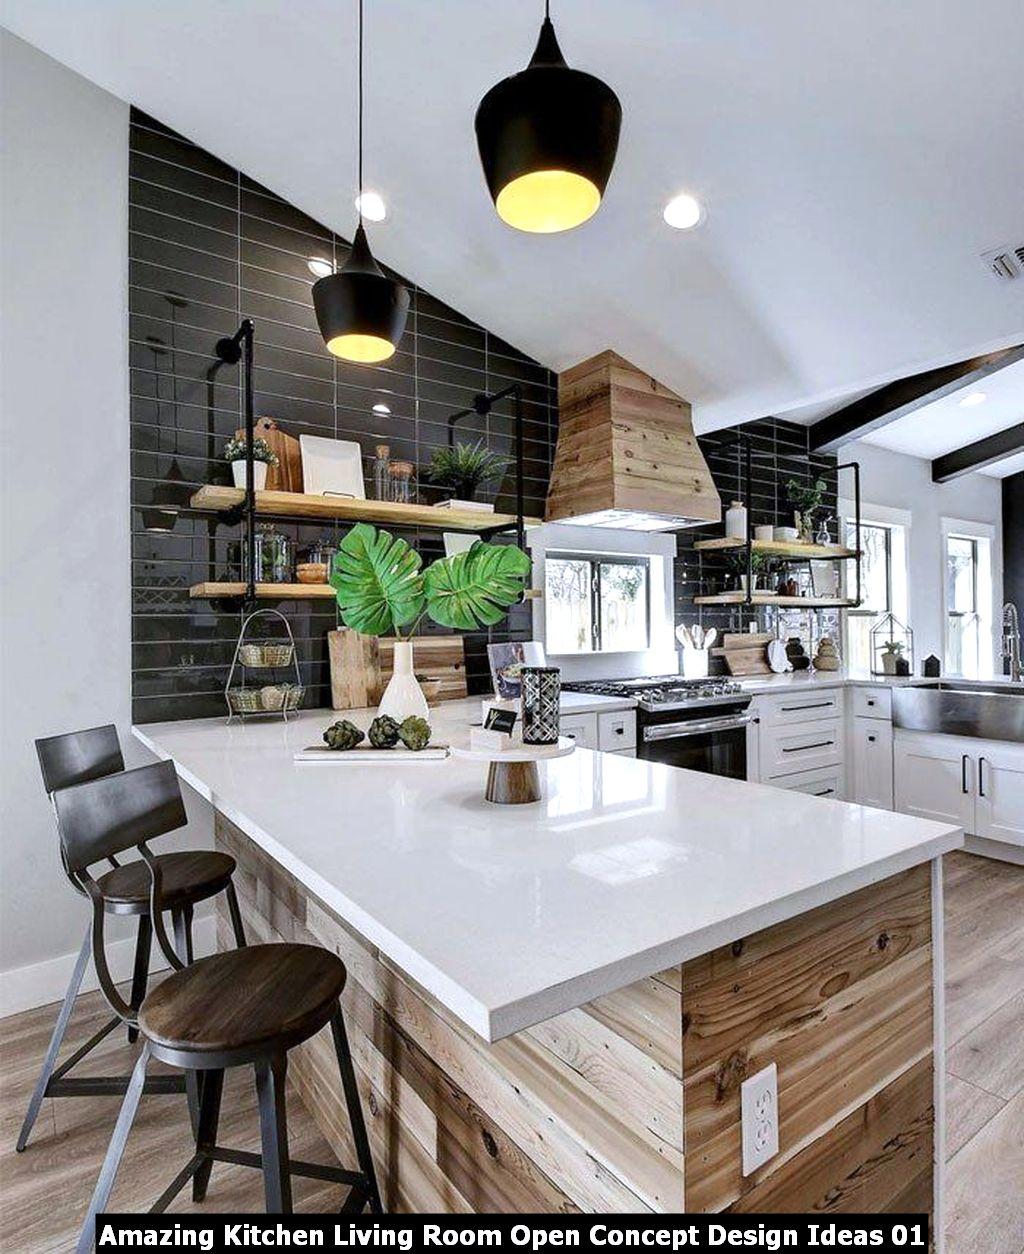 Amazing Kitchen Living Room Open Concept Design Ideas 01